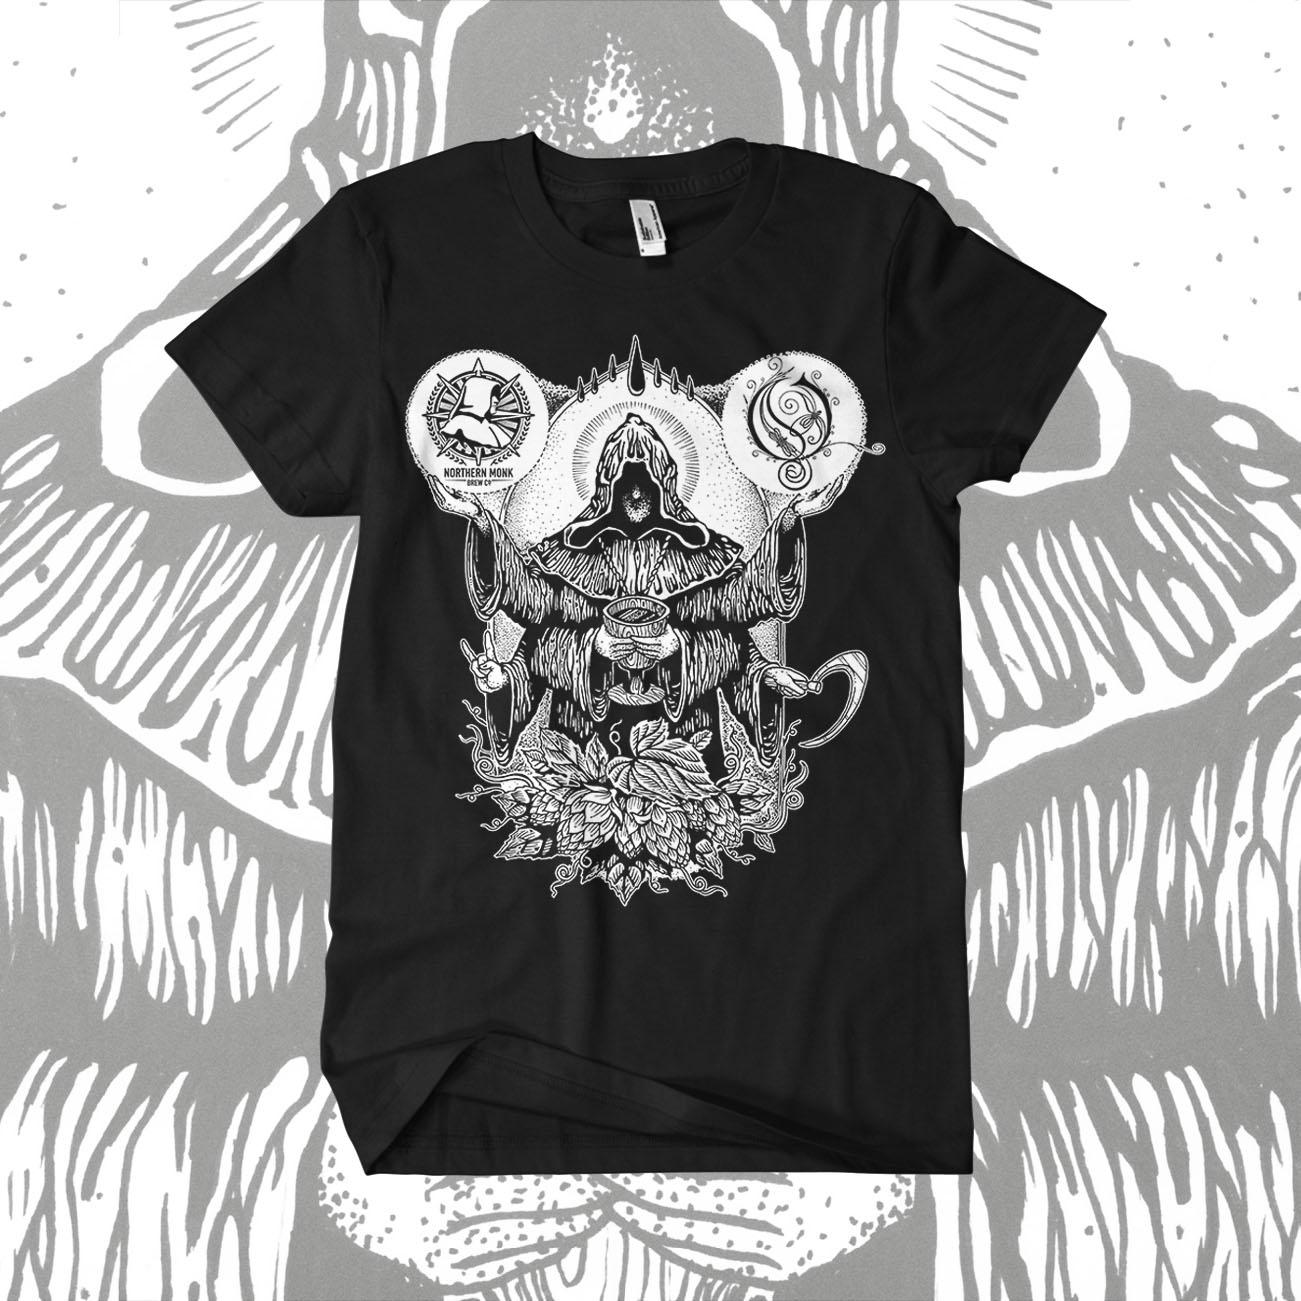 Opeth - Northern Monk T-Shirt - Opeth